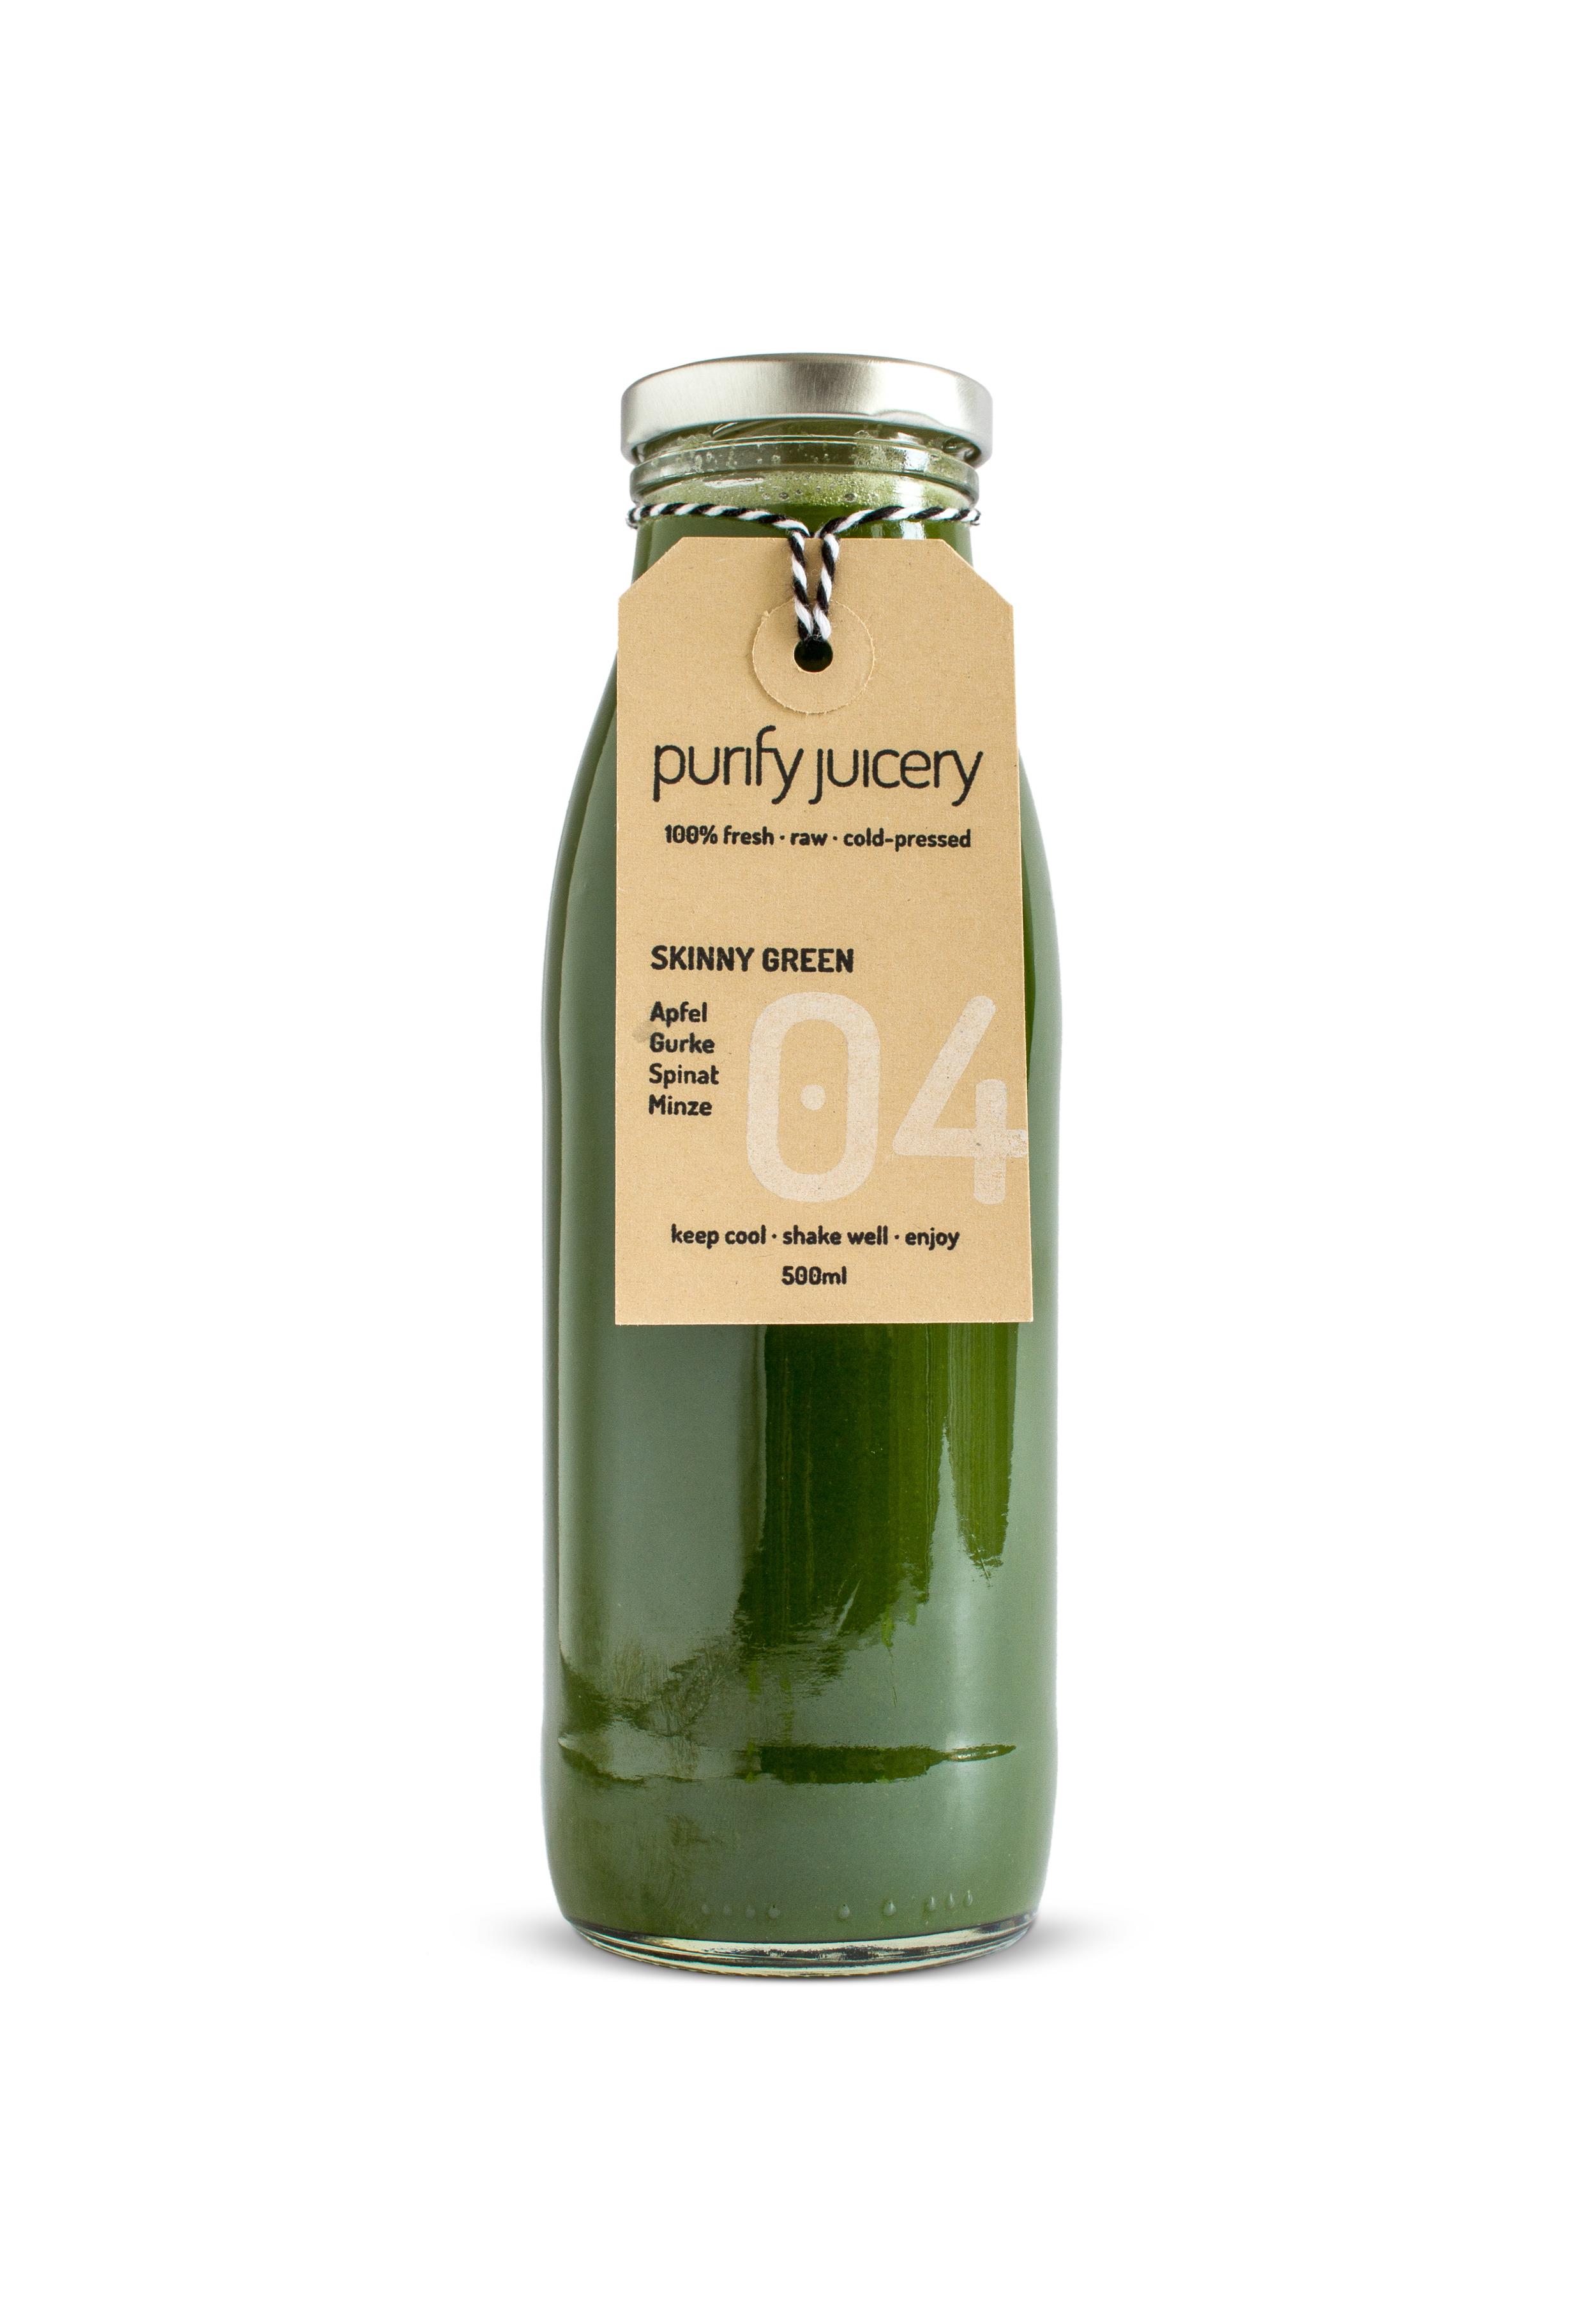 Purify_Juicery_bottles_04.jpg